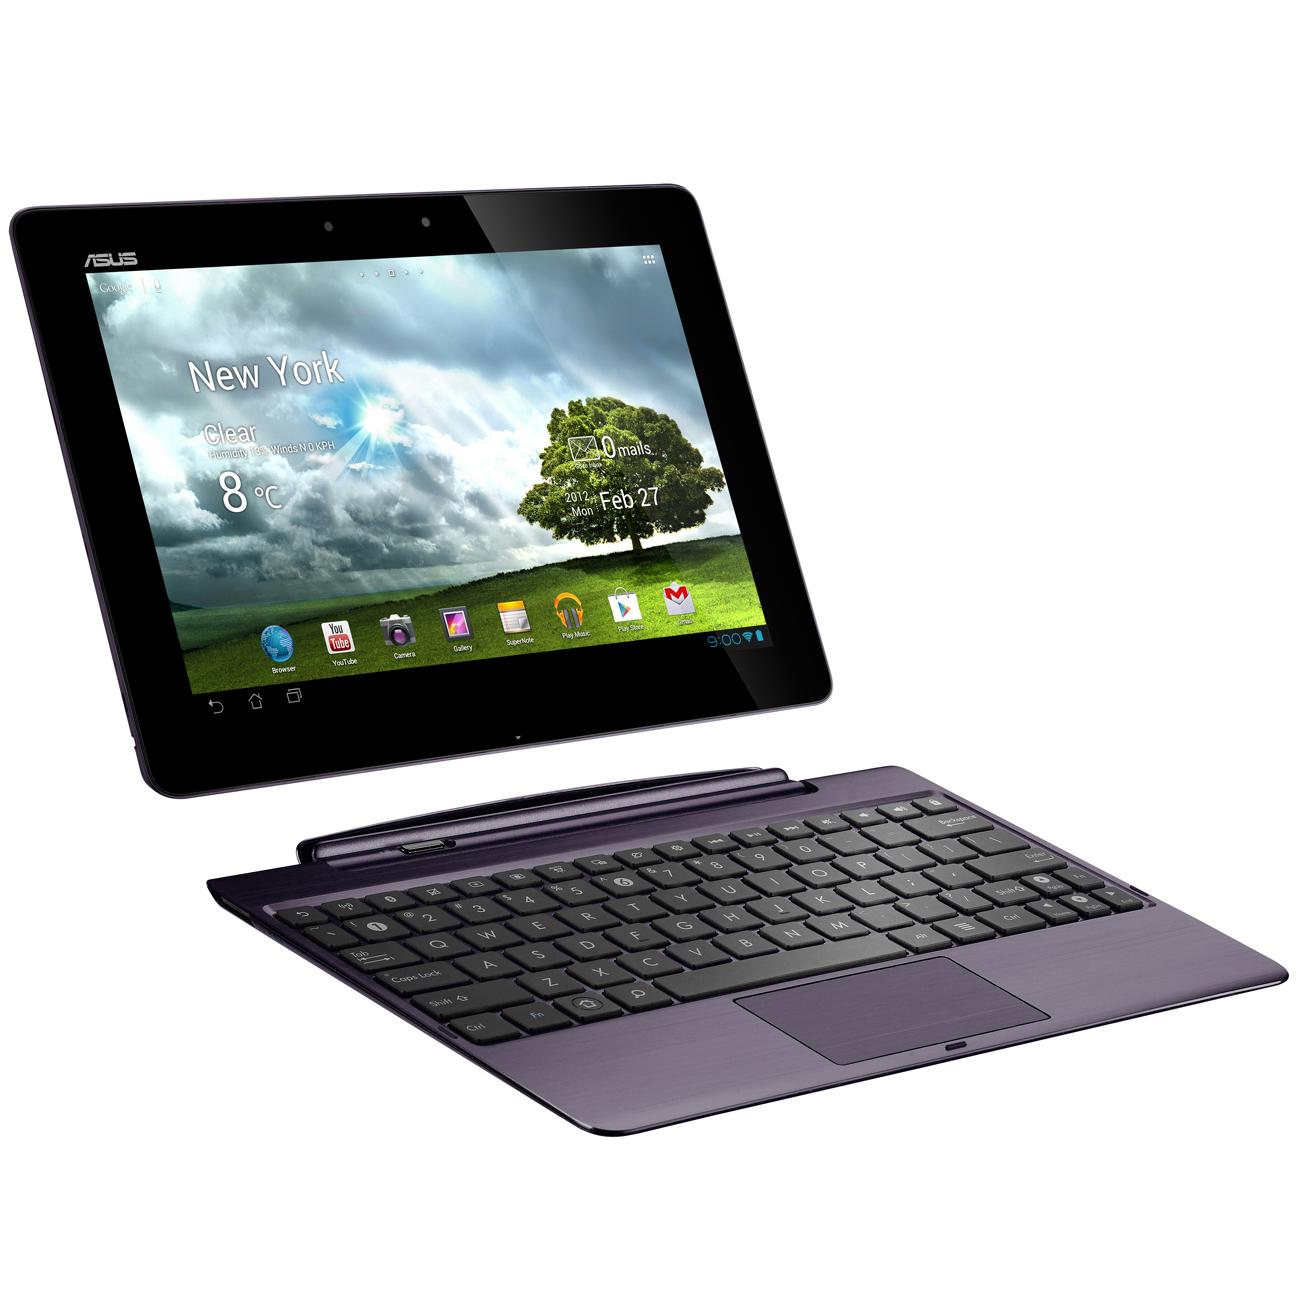 asus transformer pad infinity tf700t 1b069a dock mobile tablette tactile asus sur ldlc. Black Bedroom Furniture Sets. Home Design Ideas